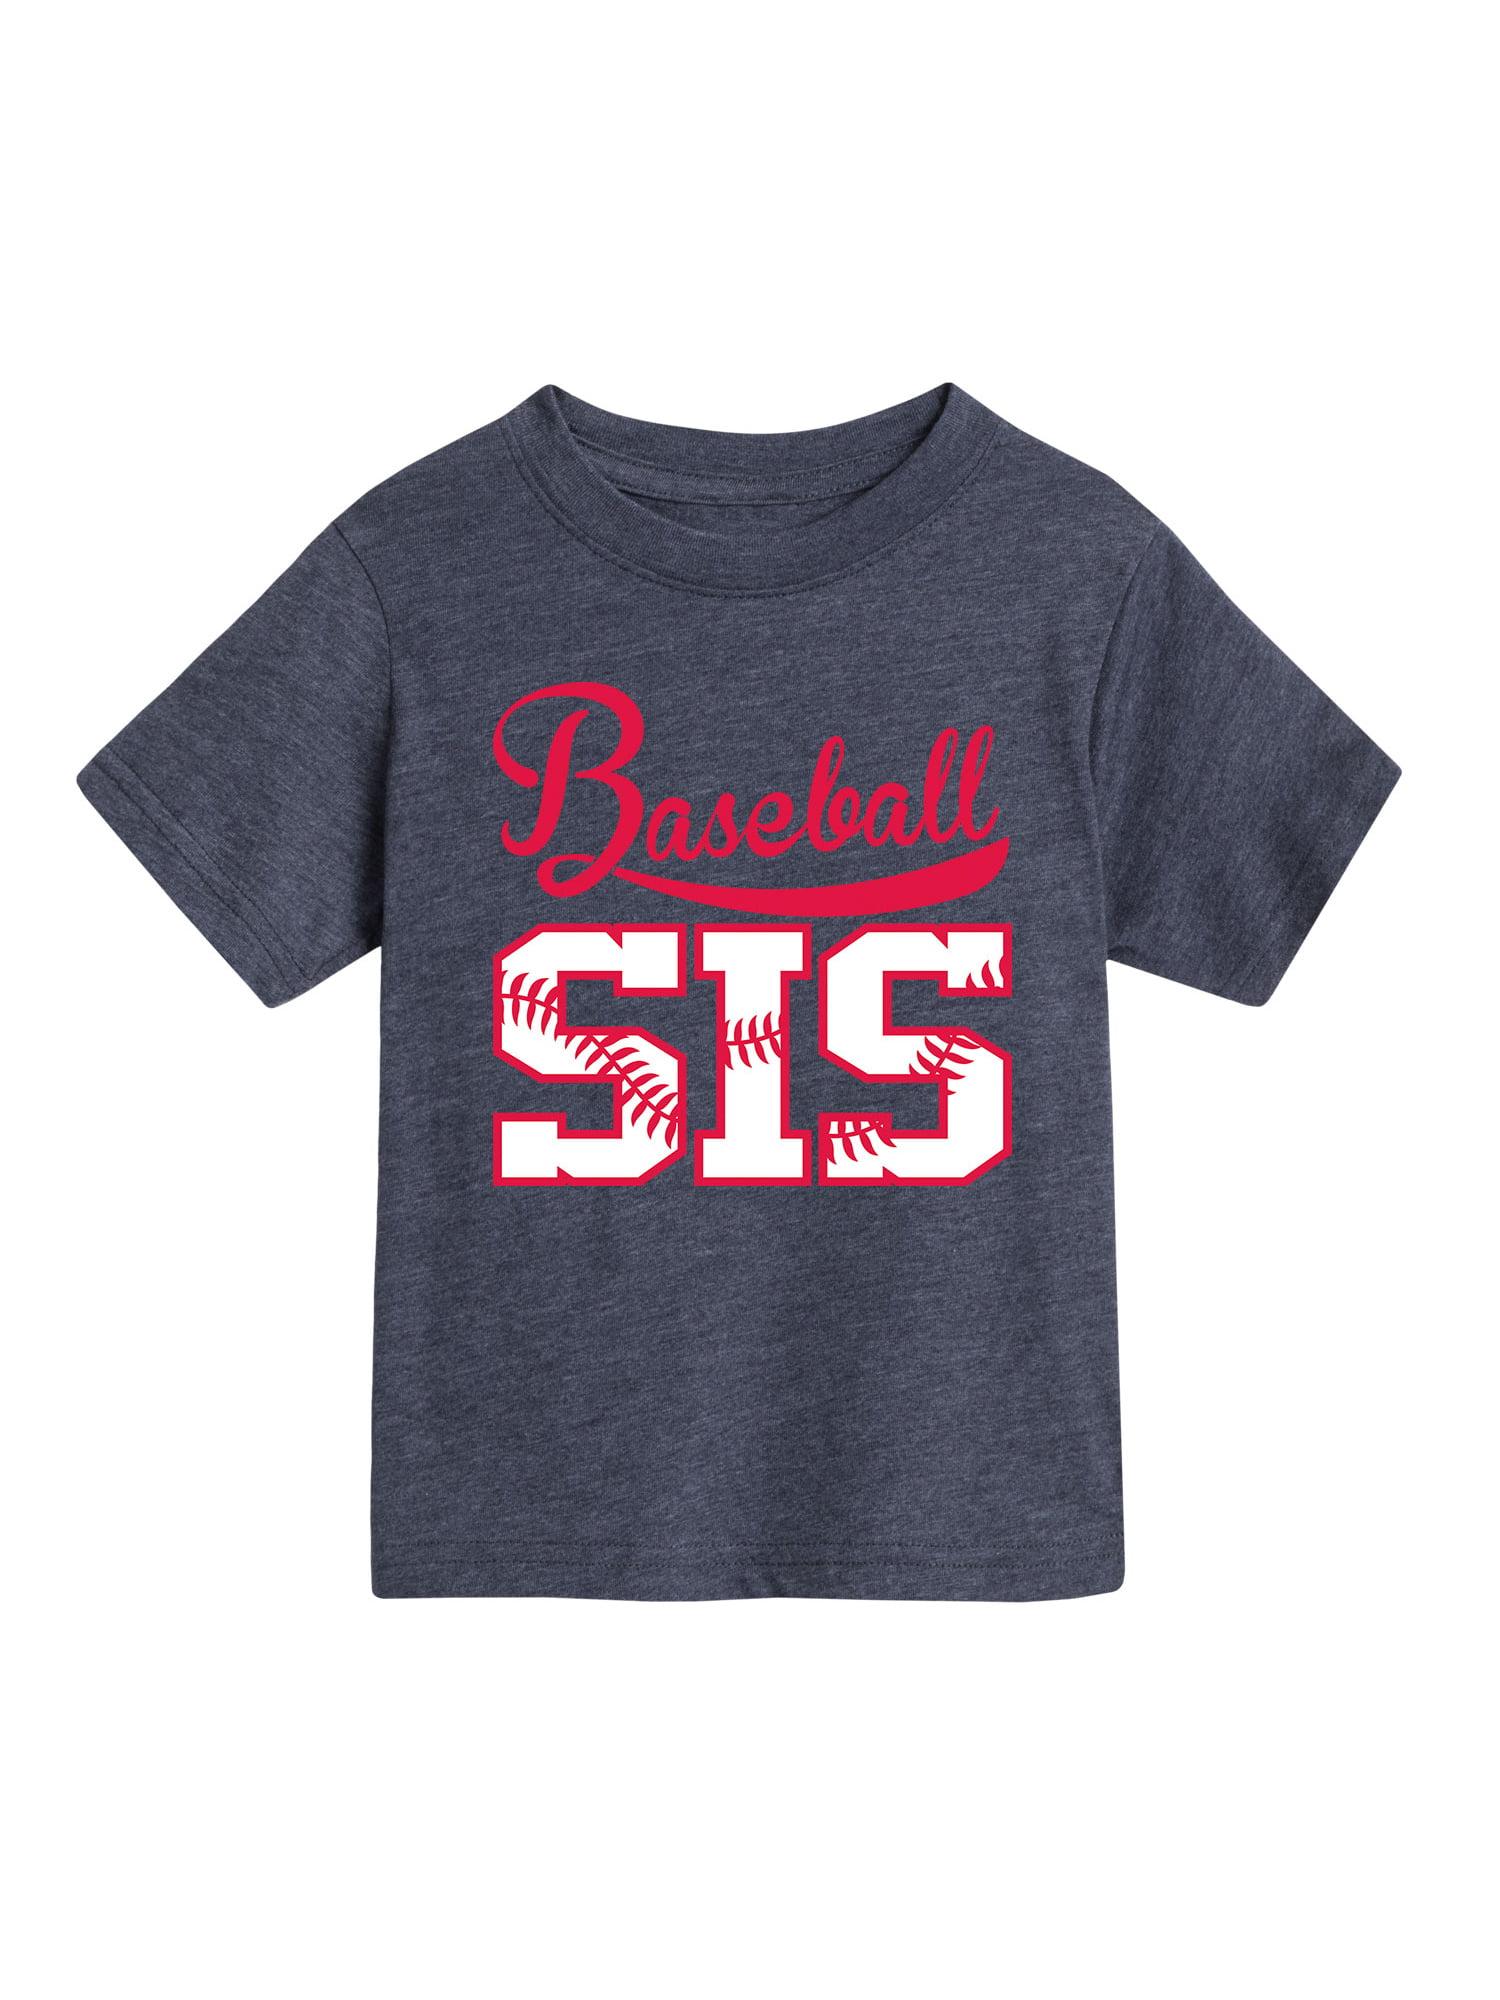 Baseball Sis  - Toddler Short Sleeve Tee